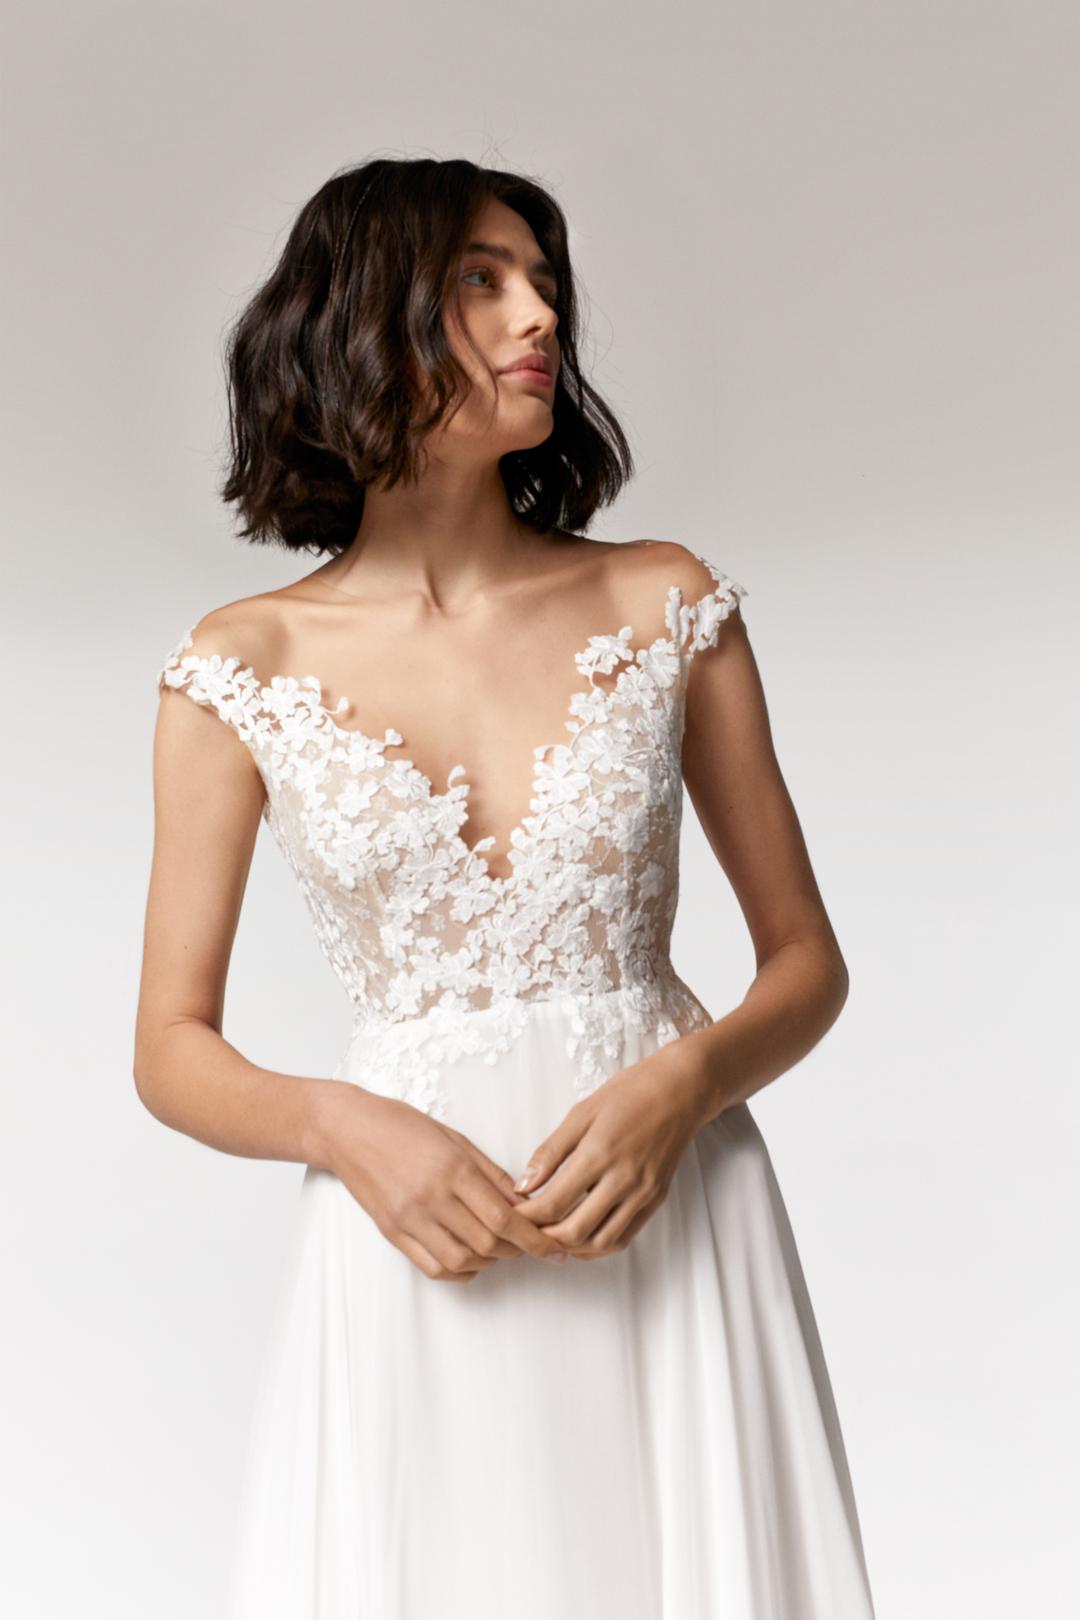 angeline dress photo